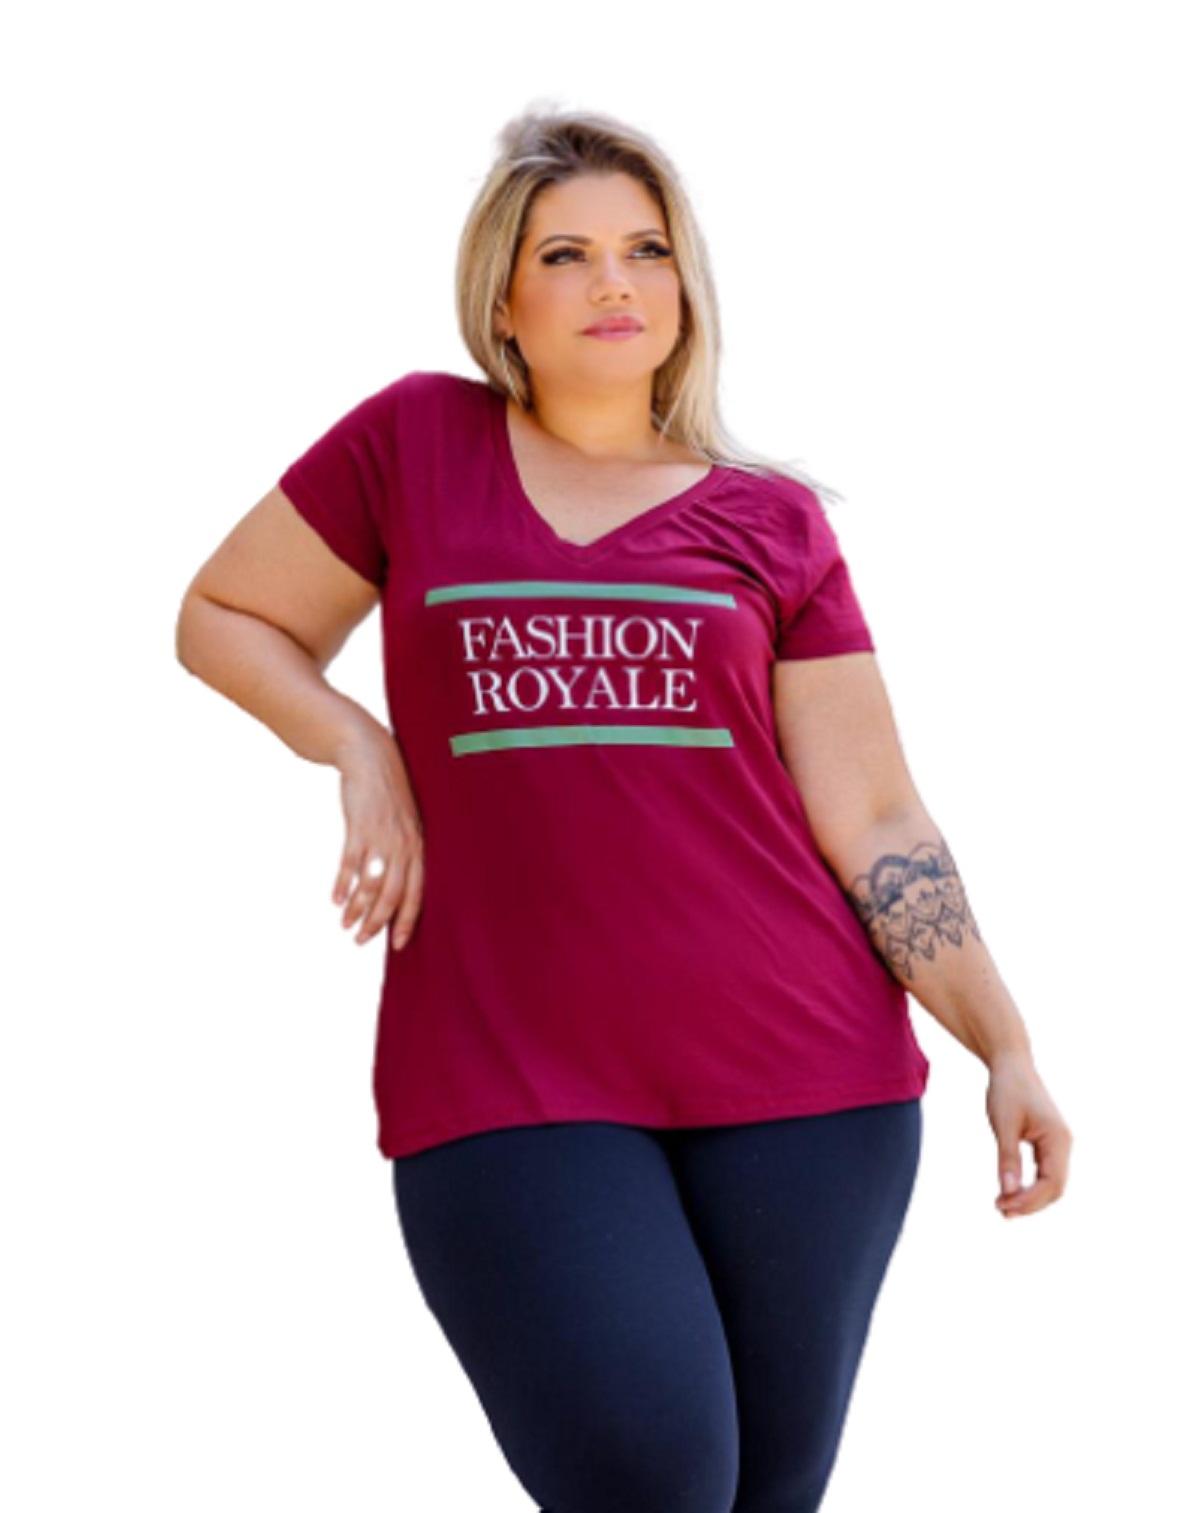 Blusa Feminina Especial G7 Fashion Royale Plus Size Mazal